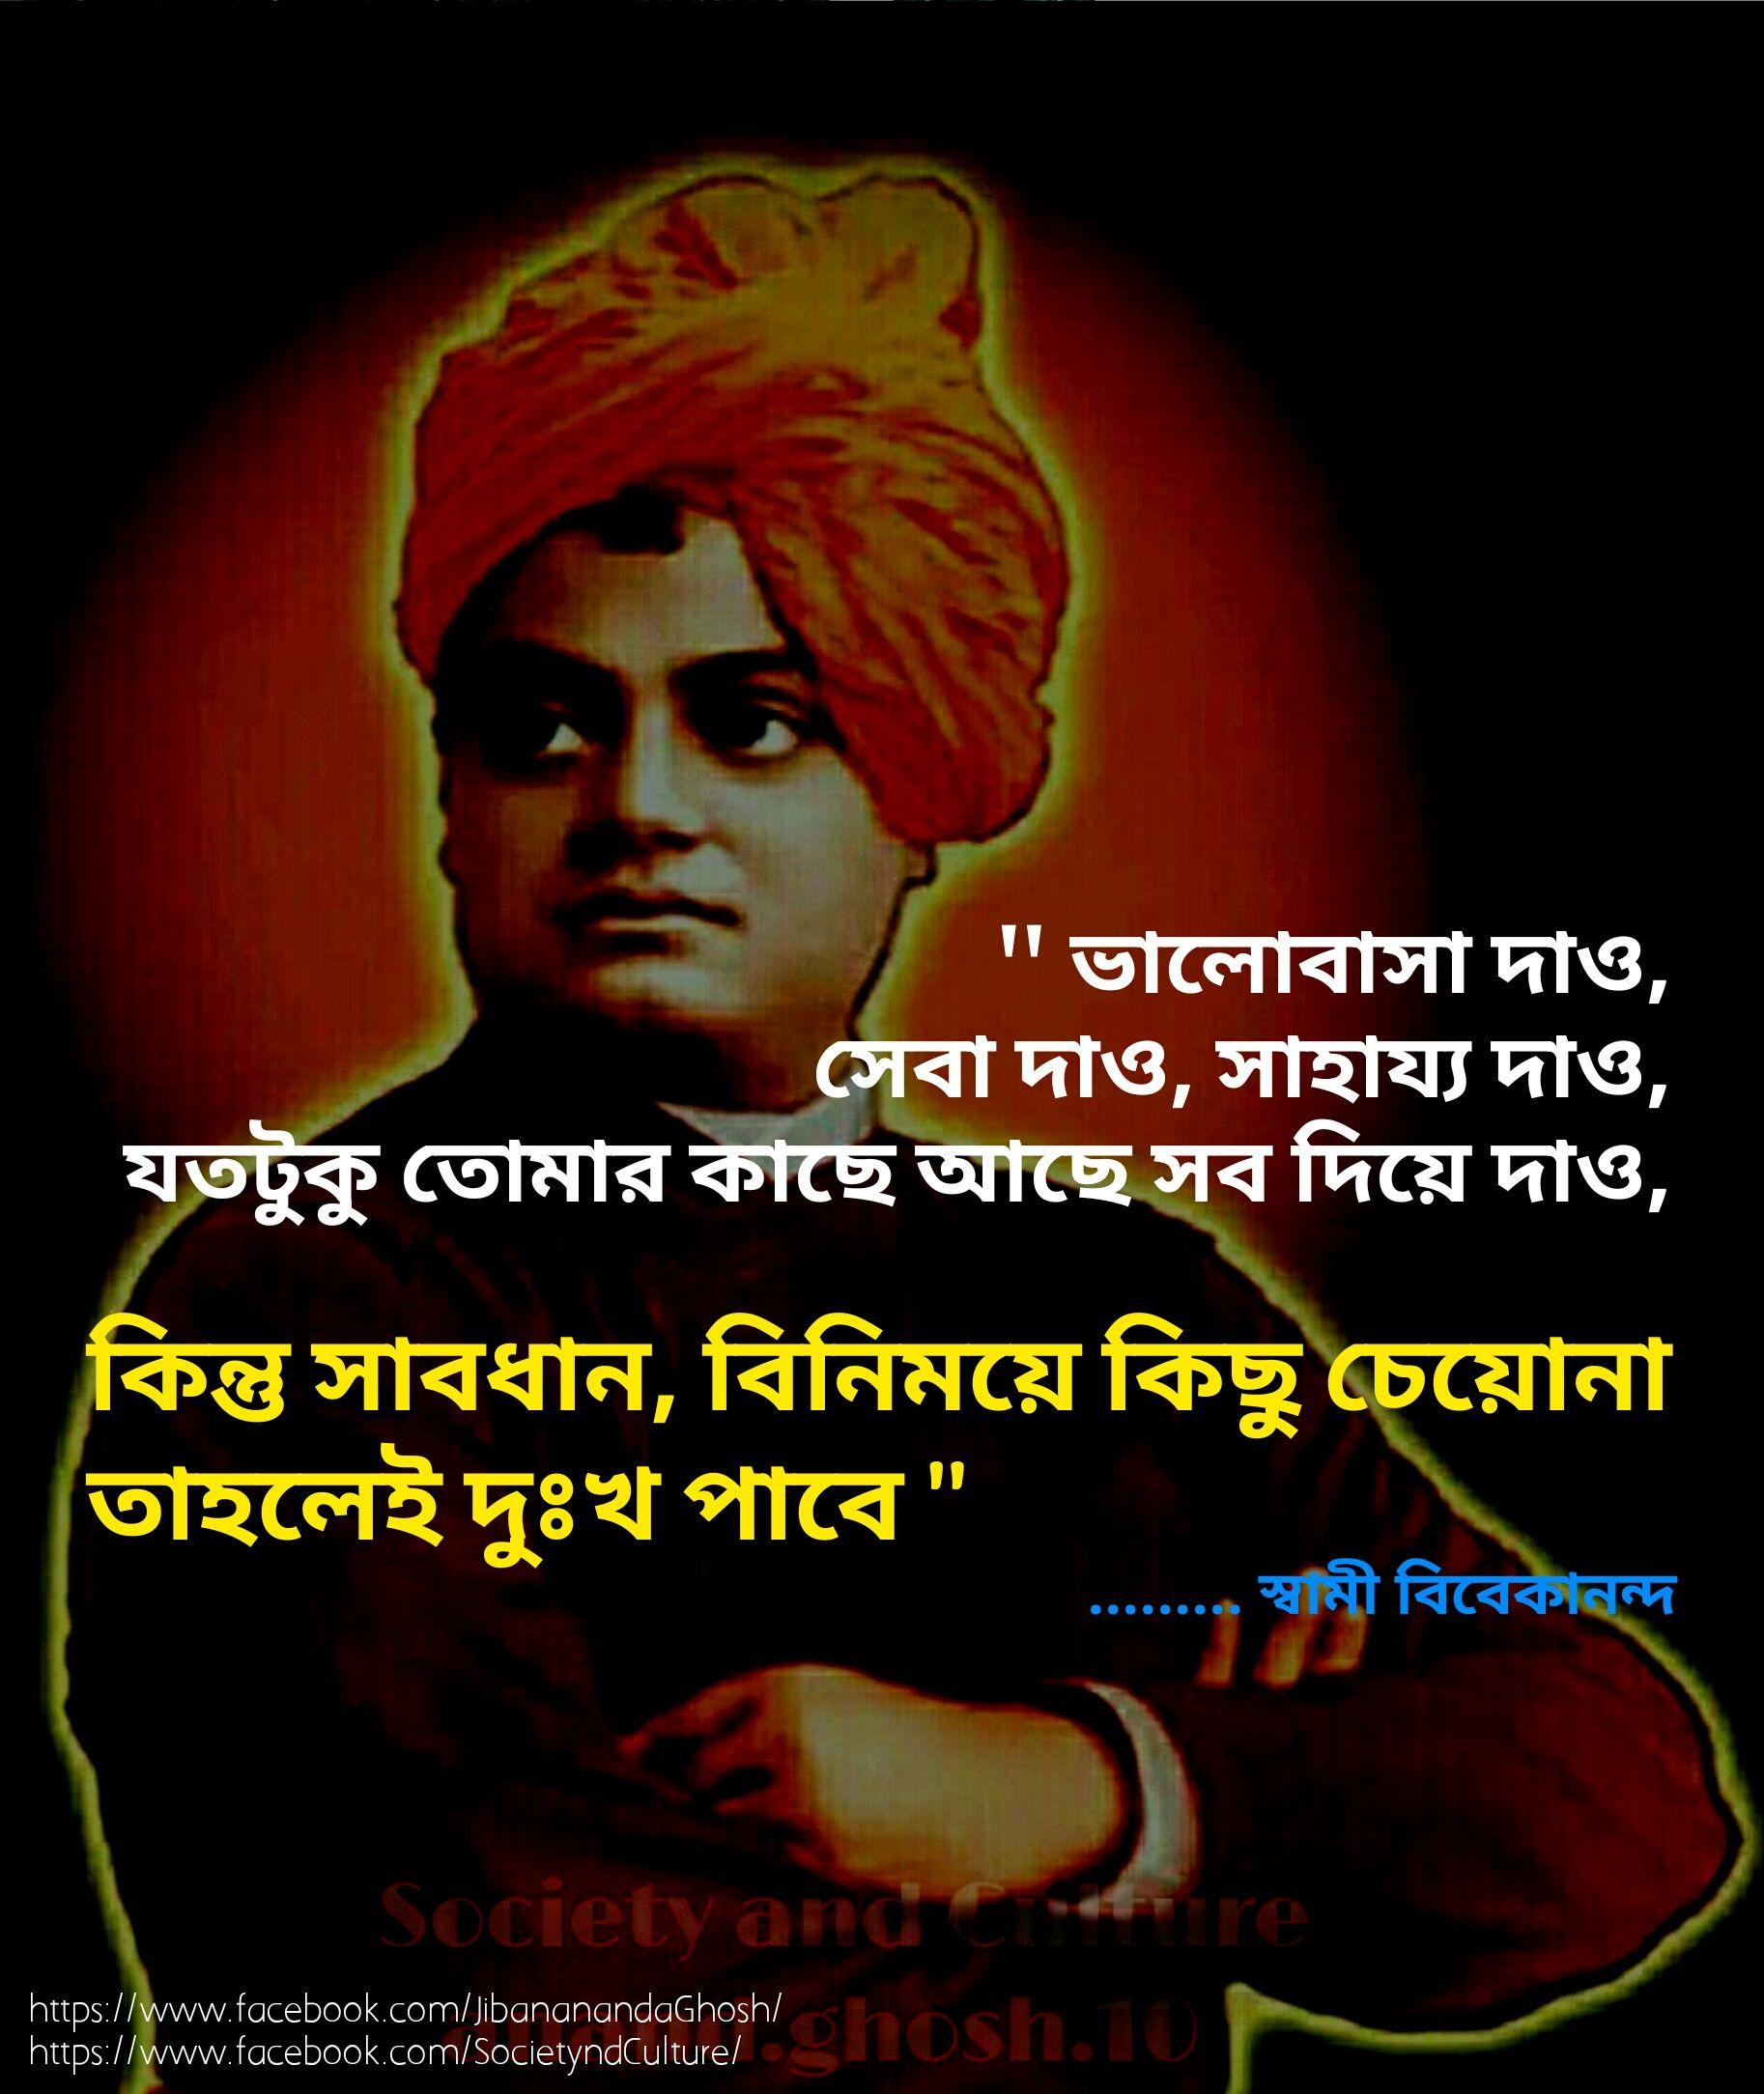 Vivekananda Bengali quote Swami vivekananda quotes